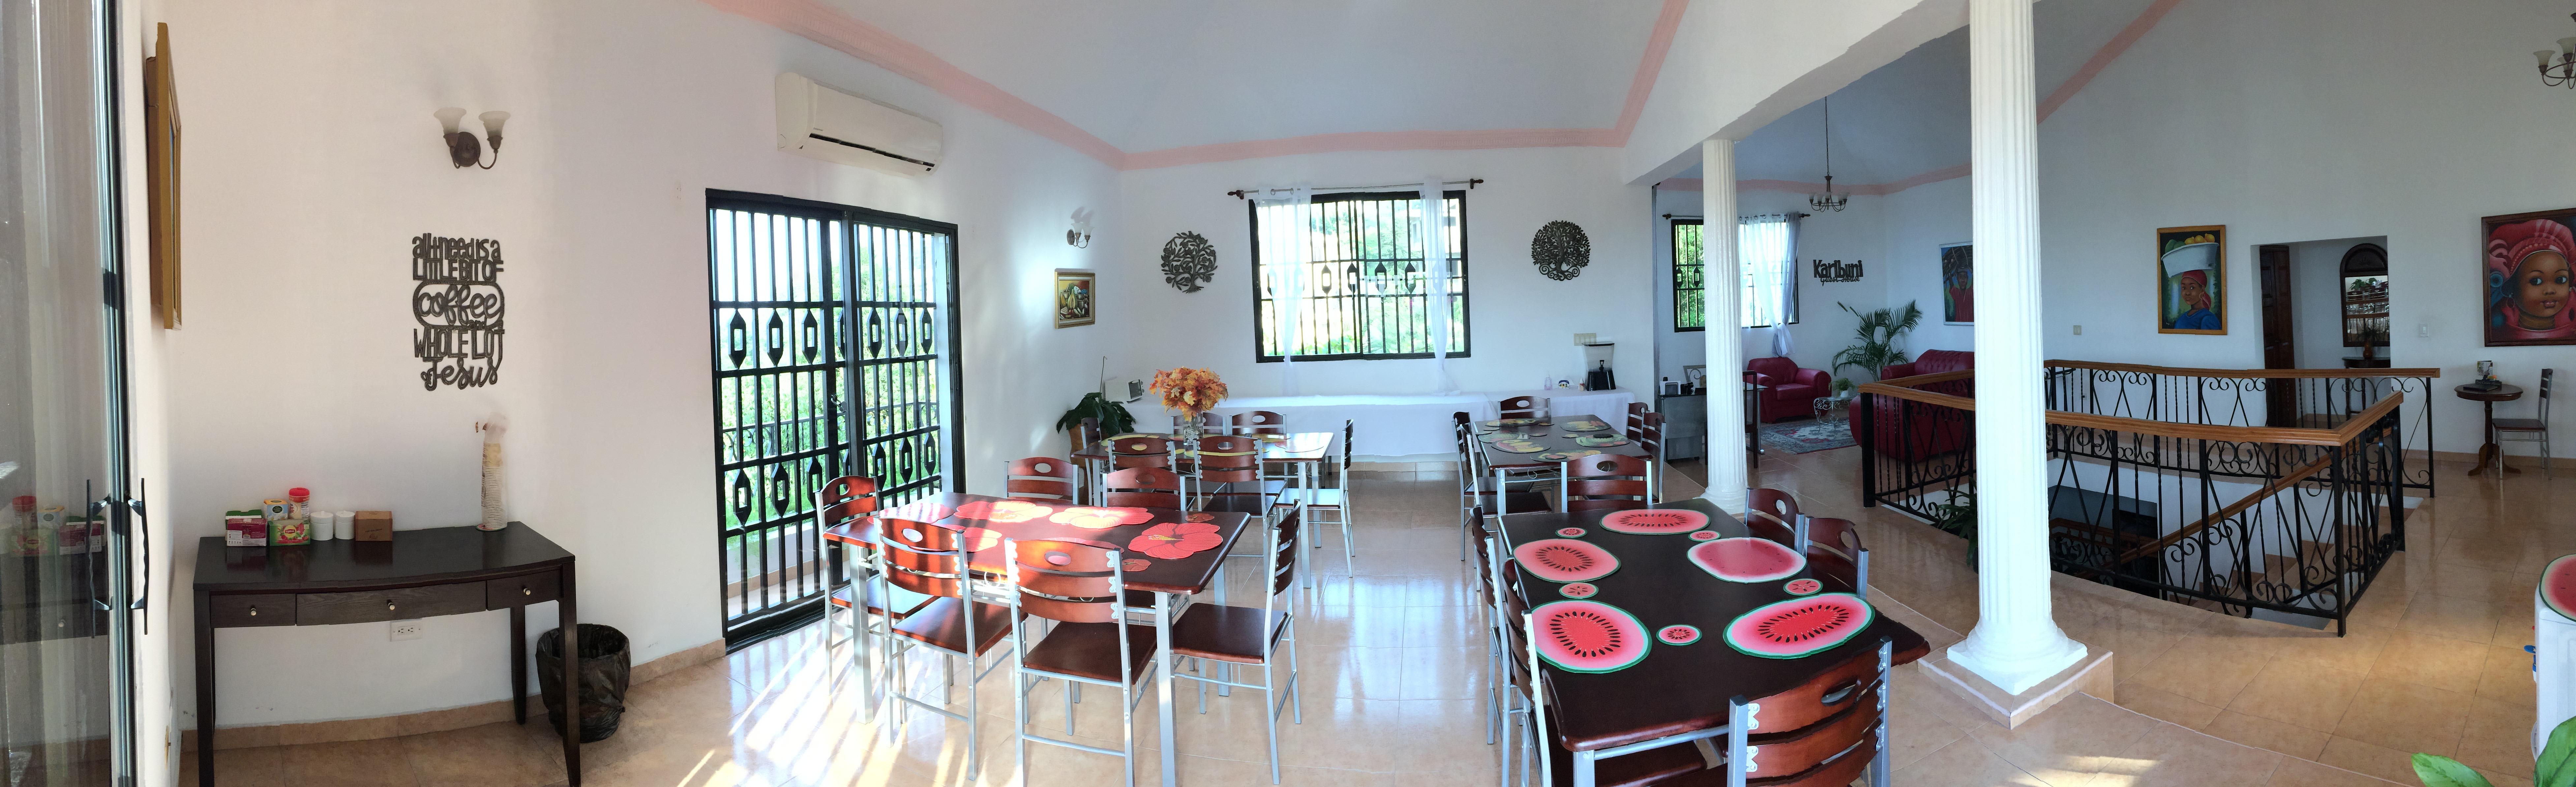 Cafeteria, eating area at Karibuni